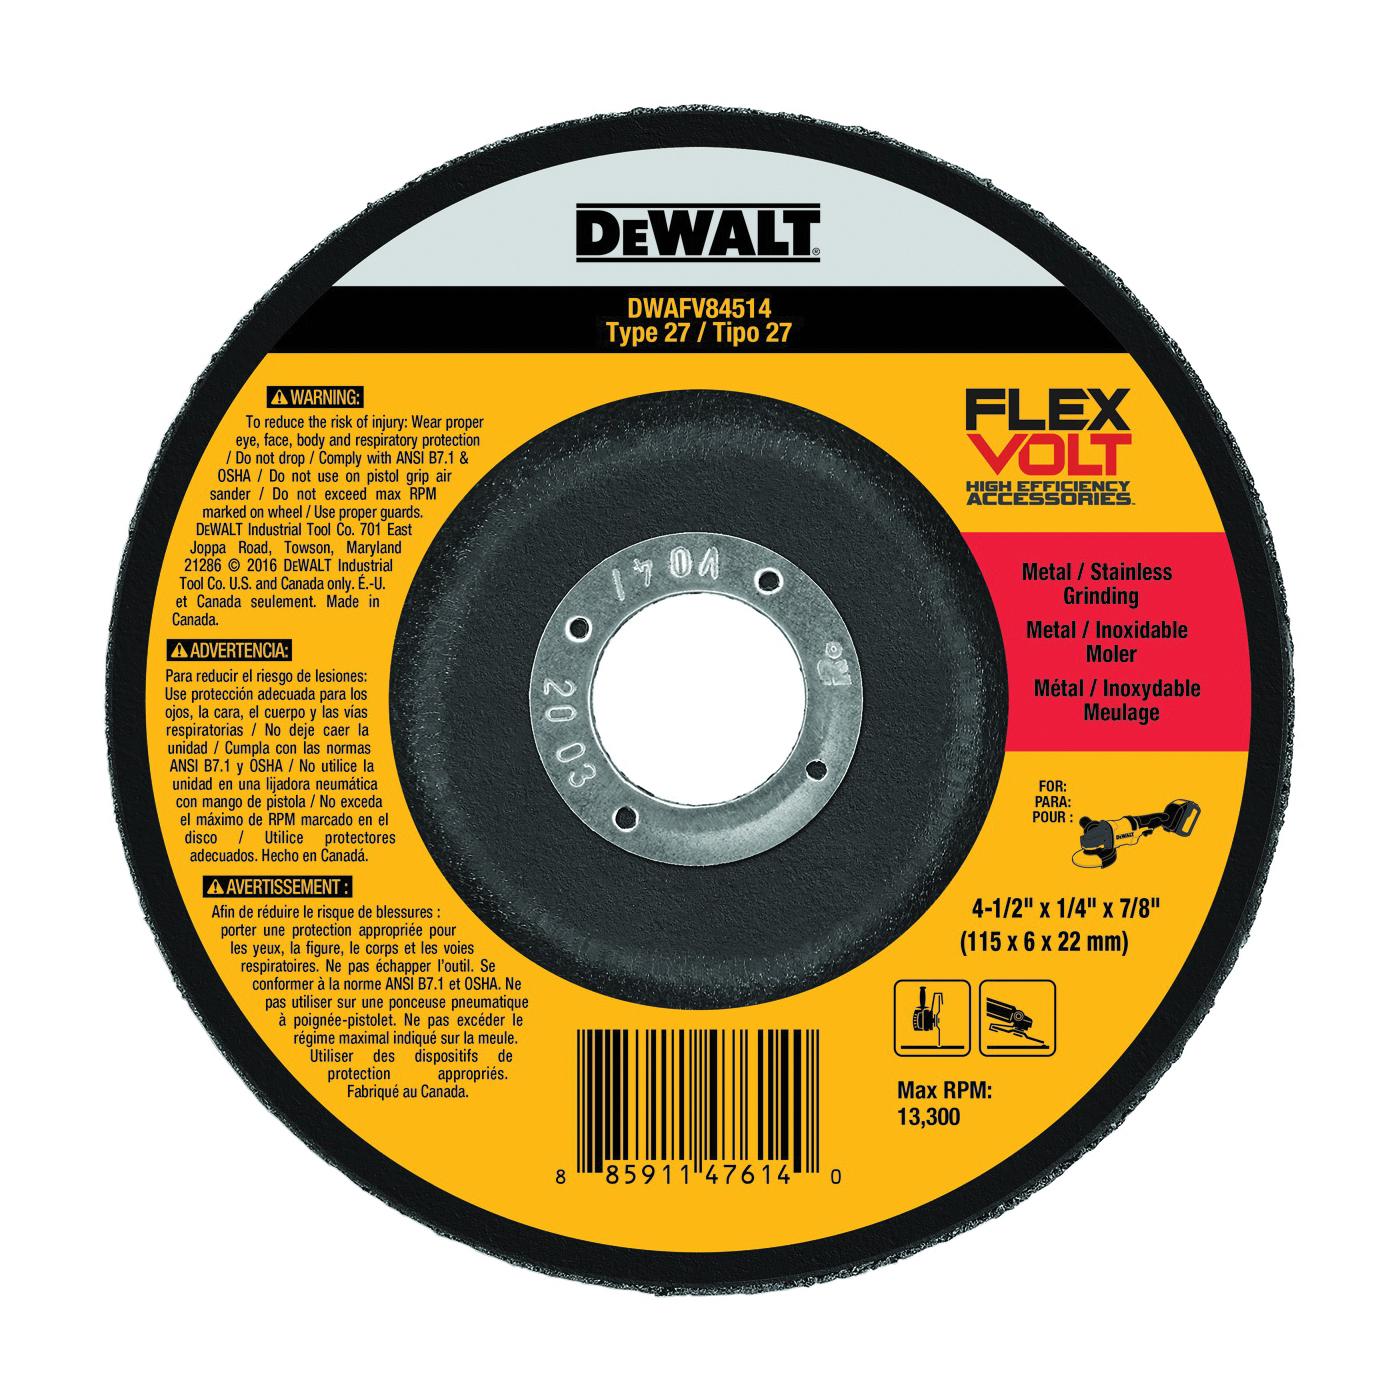 Picture of DeWALT DWAFV84514 Grinding Wheel, 4-1/2 in Dia, 1/4 in Thick, 7/8 in Arbor, Ceramic Abrasive